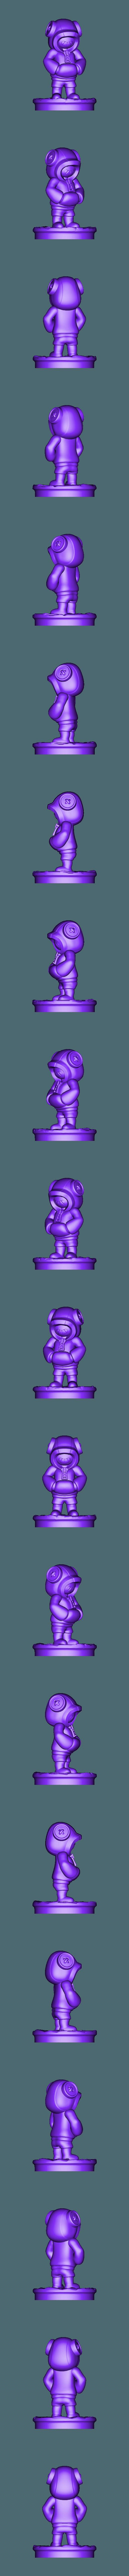 leon.OBJ Descargar archivo OBJ Leon // Brawl Stars ( Personaje legendario ) • Modelo para imprimir en 3D, MatteoMoscatelli